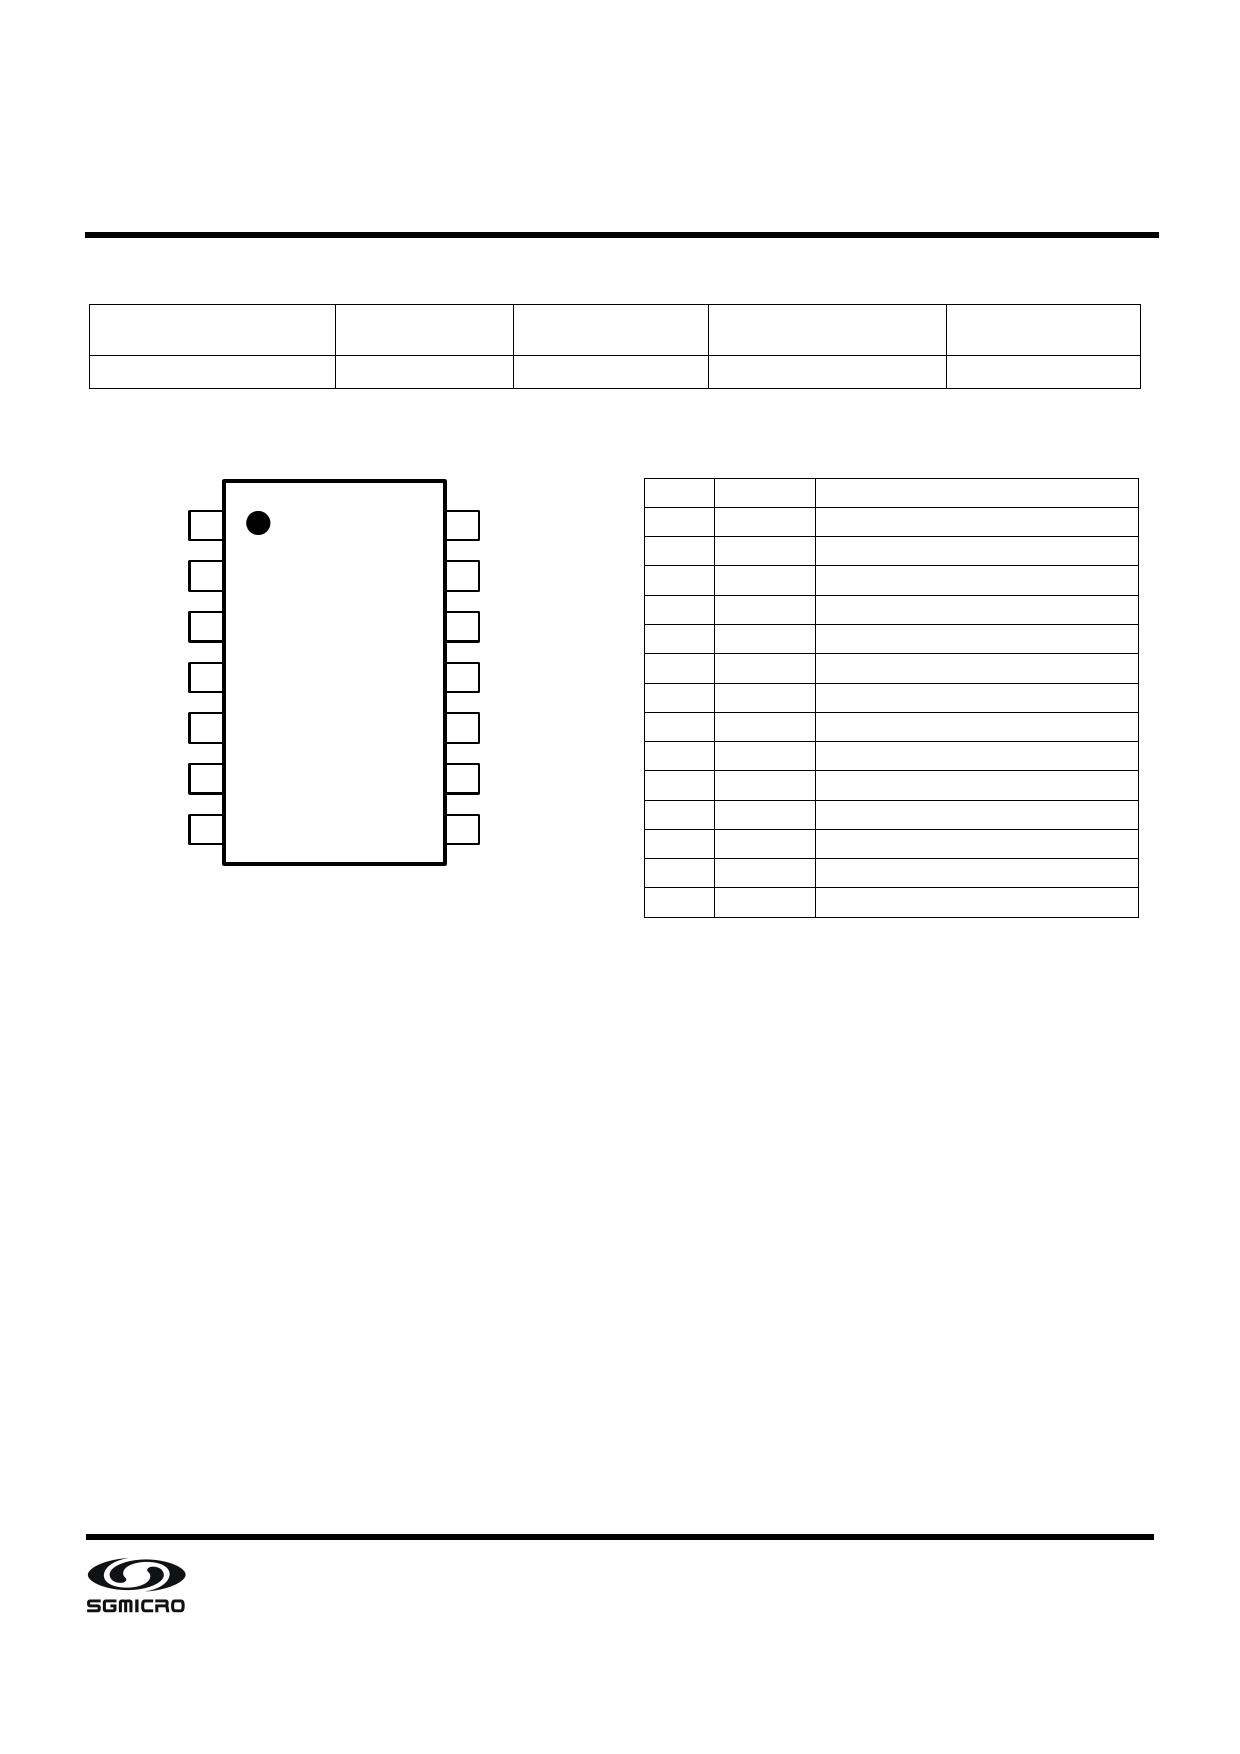 SGM9126 pdf, schematic